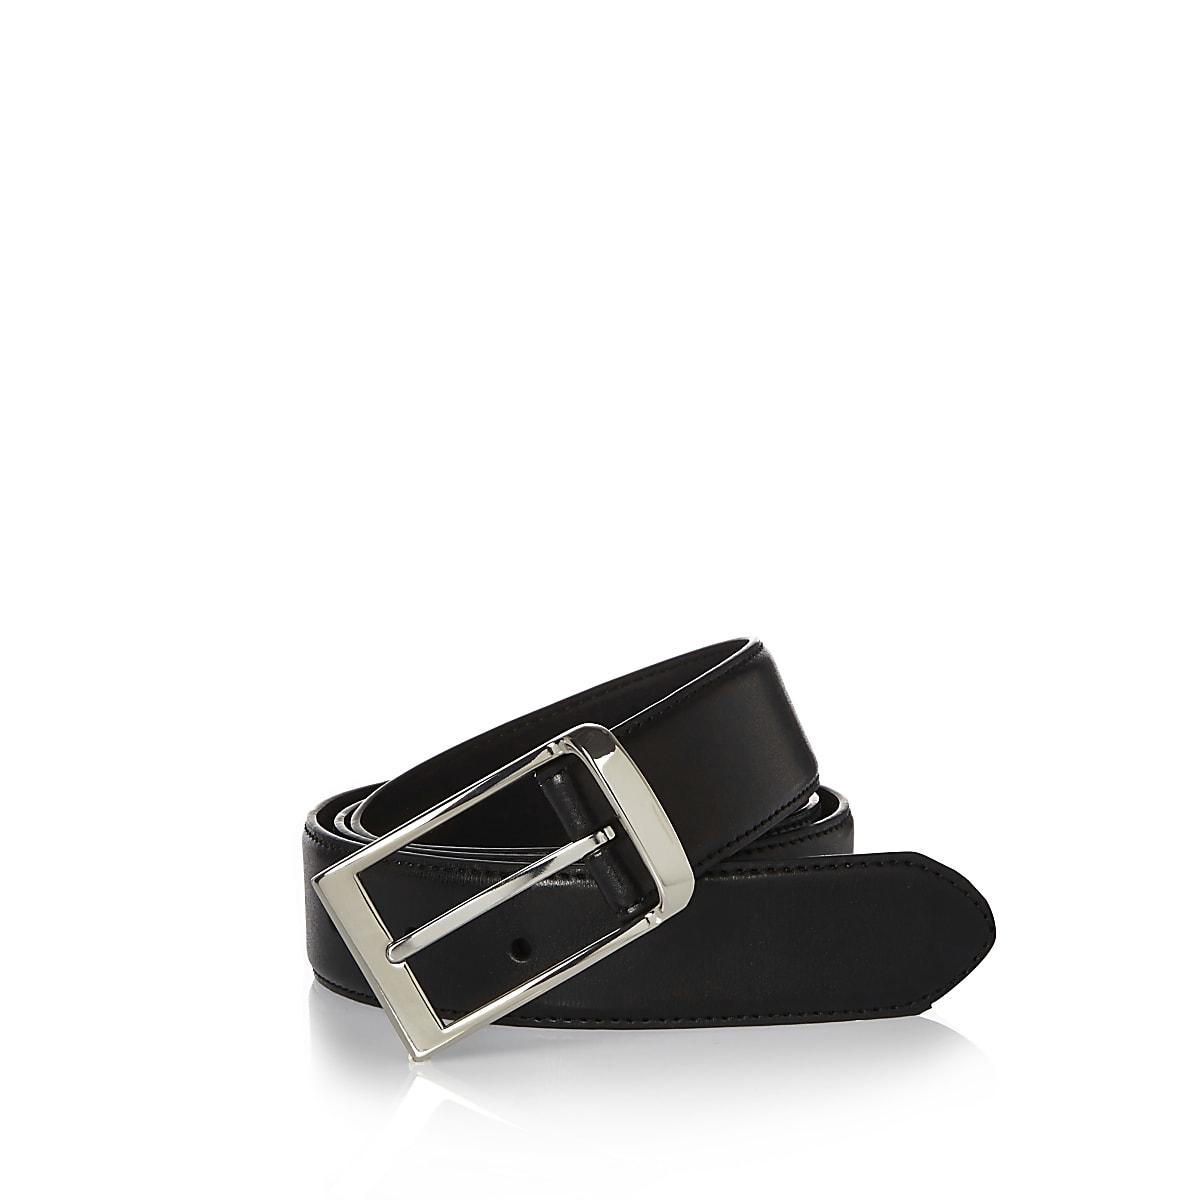 Black leather look belt